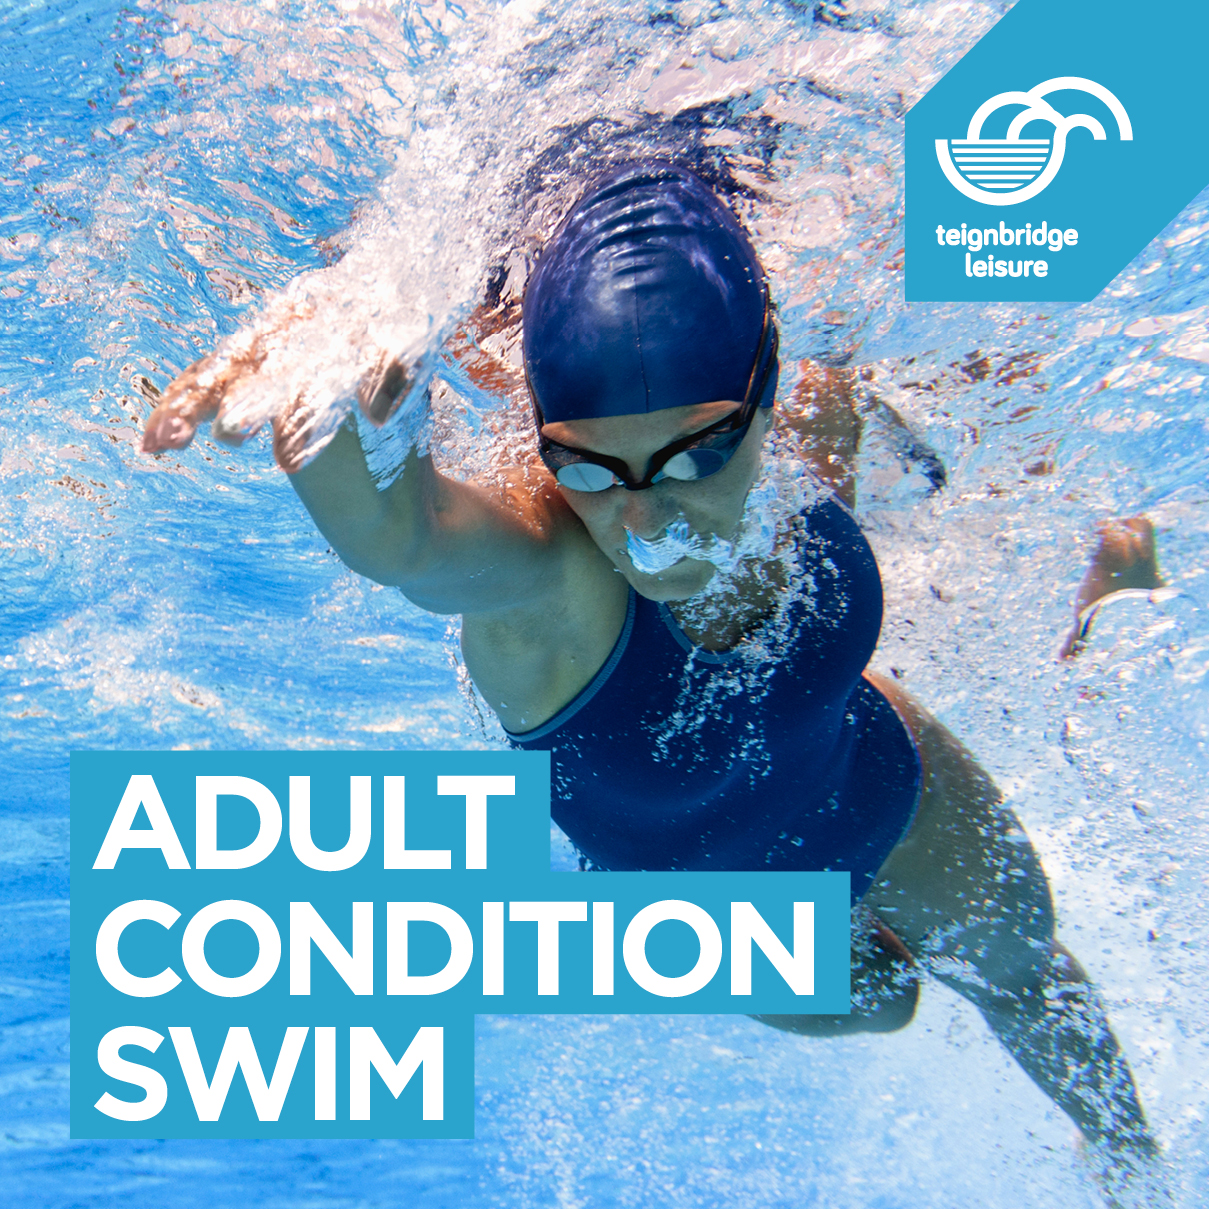 Adult Condition Swim